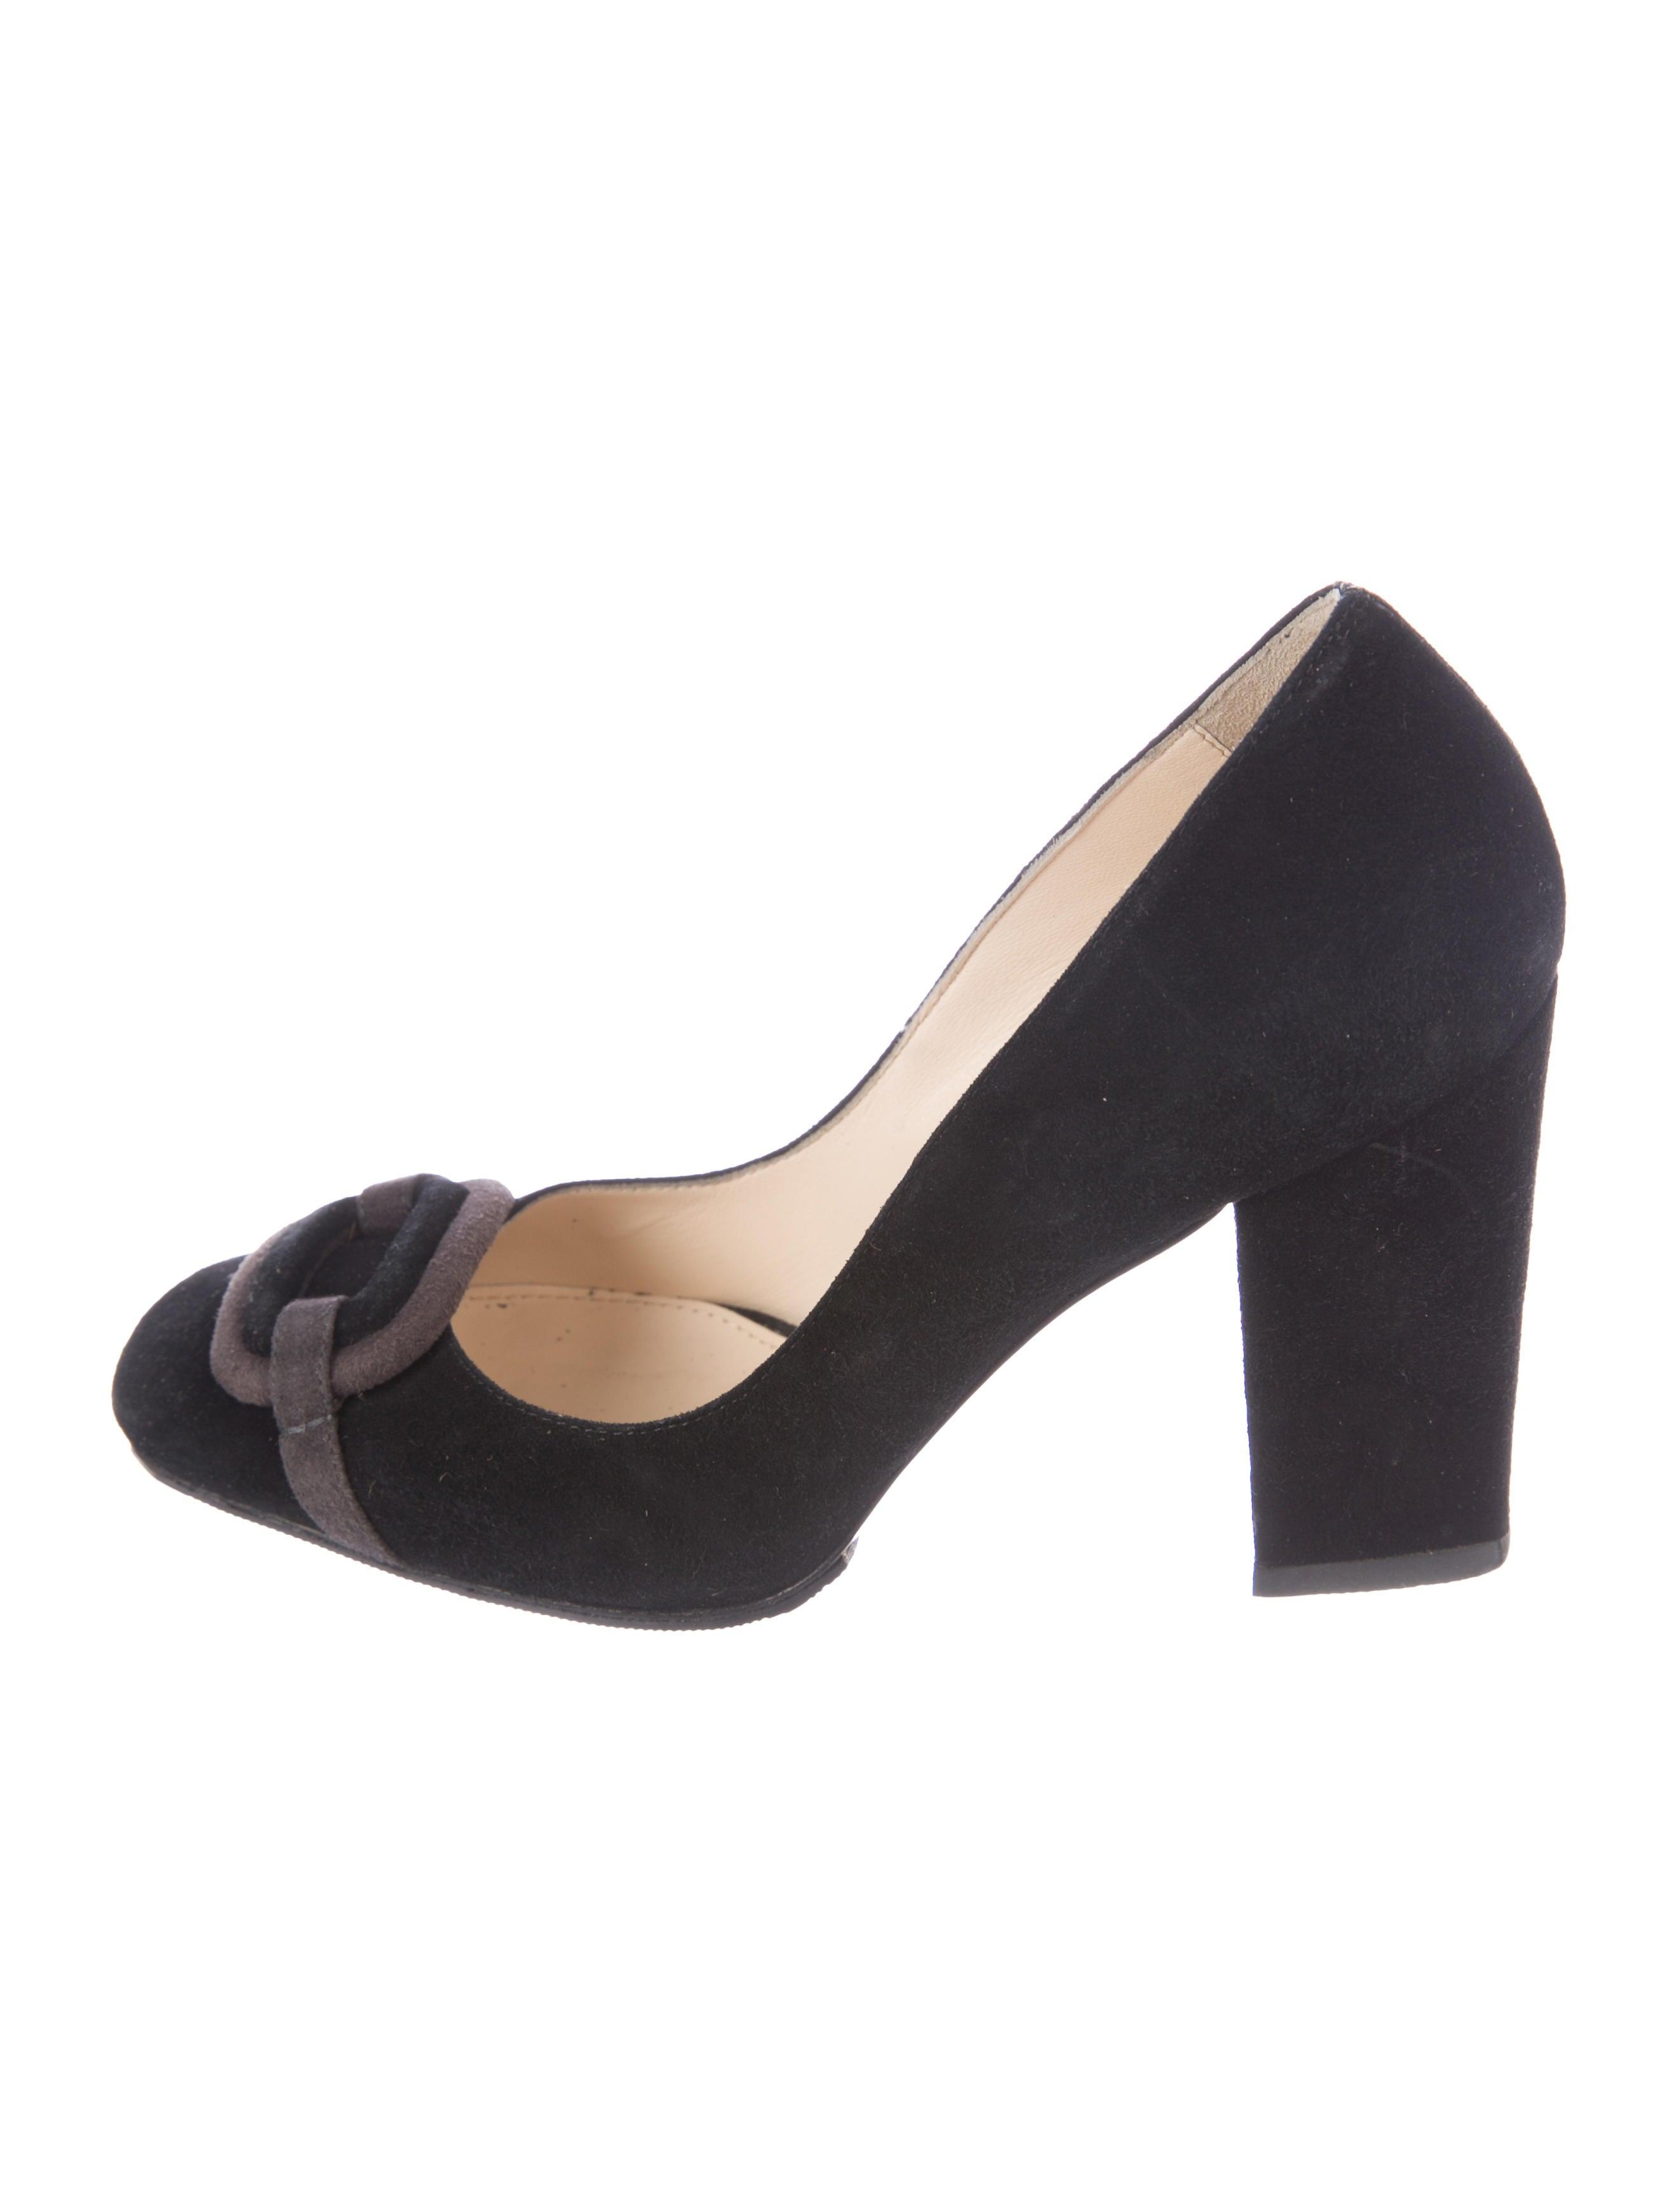 b16a5d144ae MaxMara Suede Square-Toe Pumps - Shoes - MMA26163